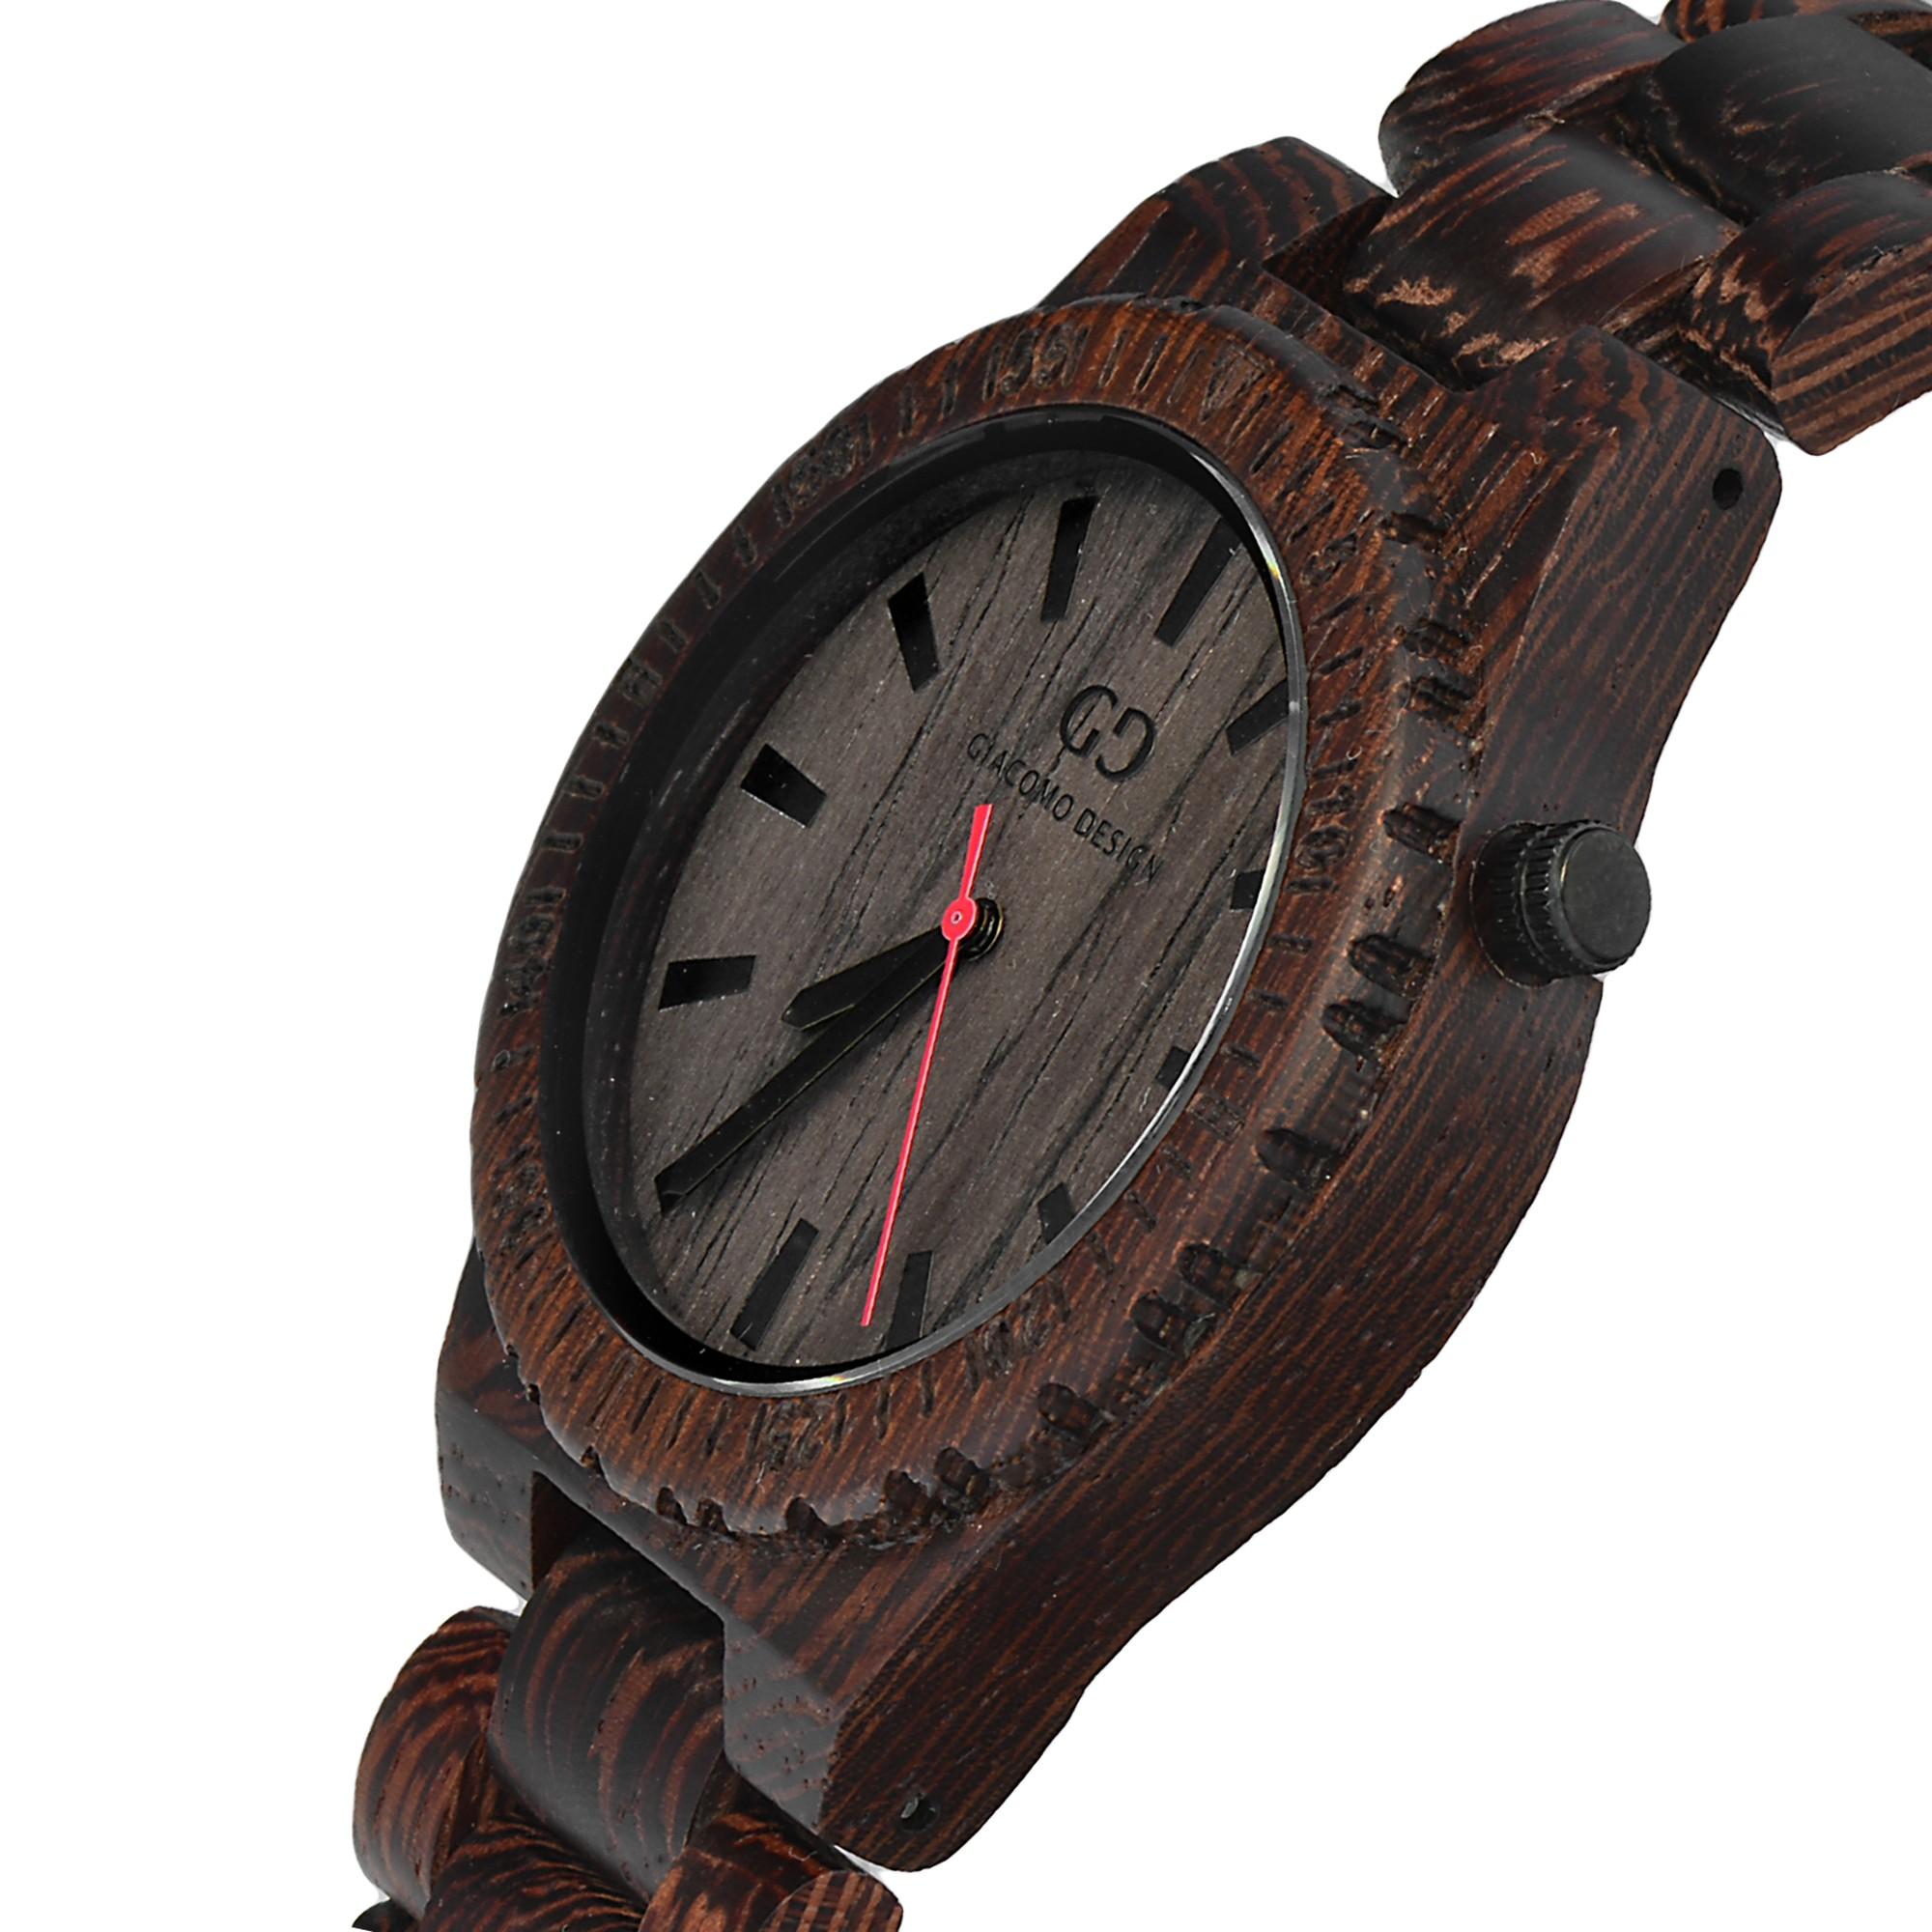 Men's watch Giacomo Design GD08601